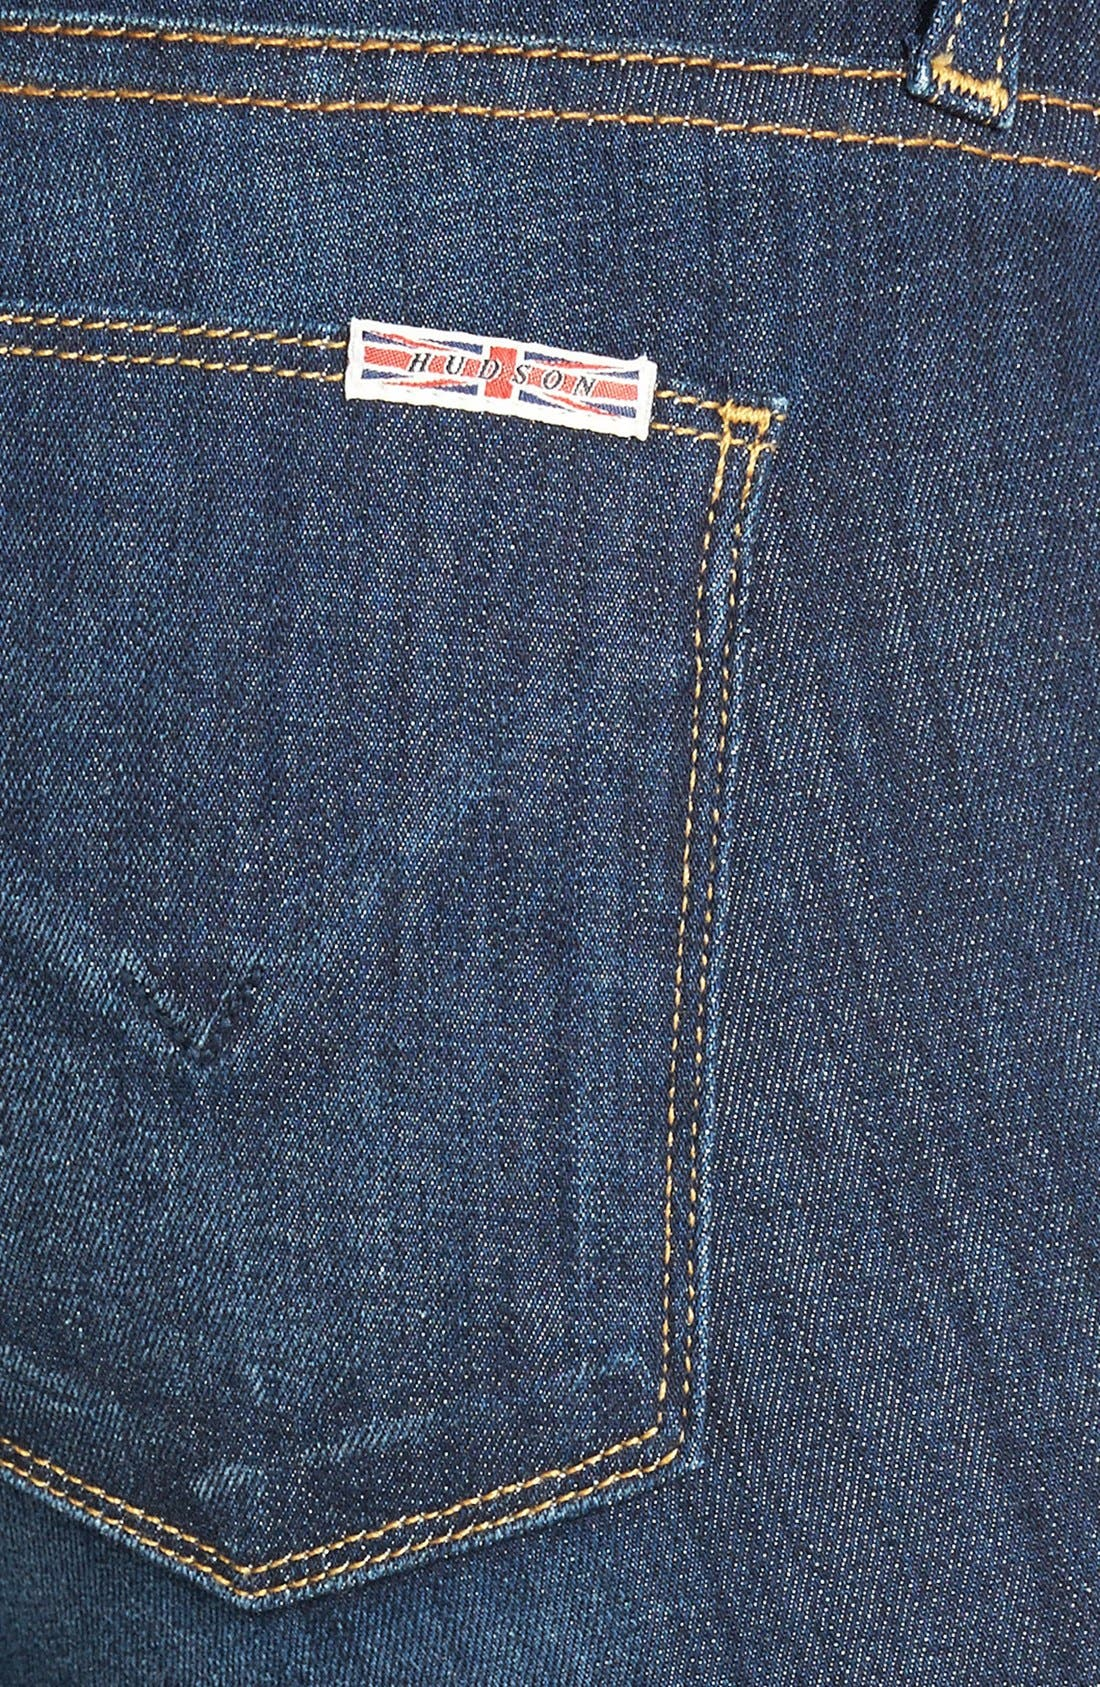 Alternate Image 3  - Hudson Jeans 'Collette' Skinny Jeans (Stella)